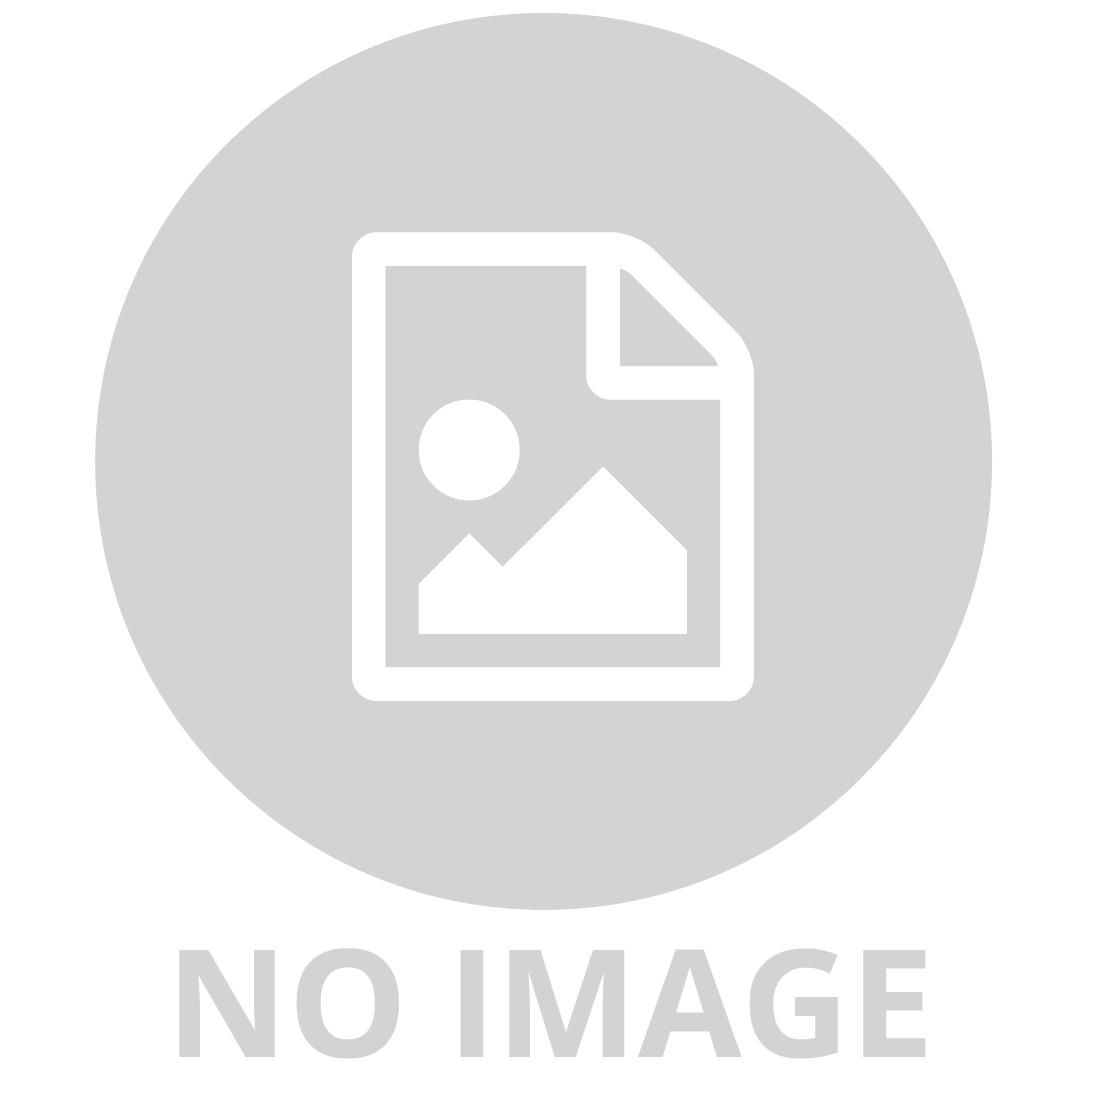 RUSCO RACING SEA RIPPER R/C BOAT